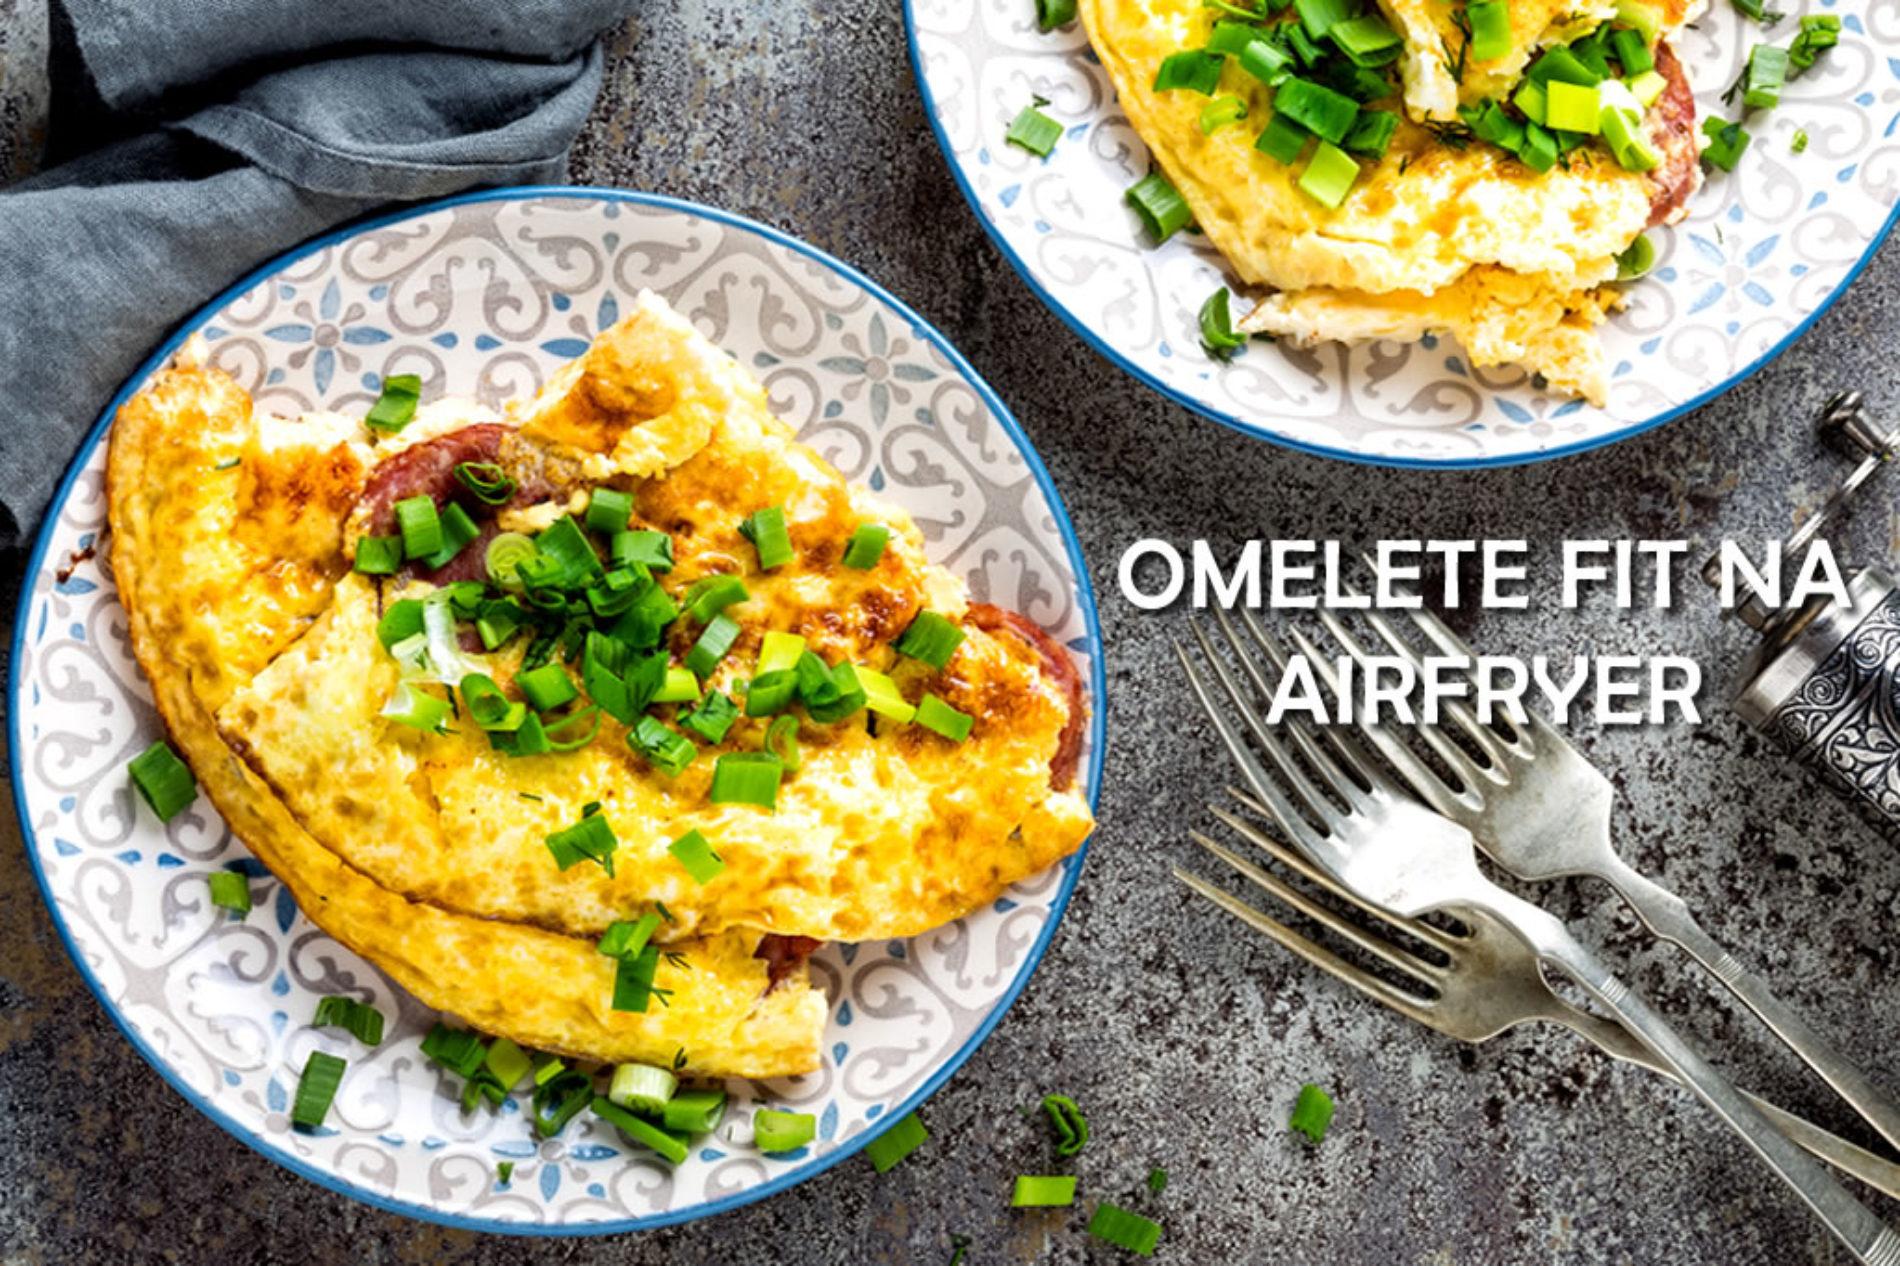 Omelete fitness de presunto e queijo na AirFryer